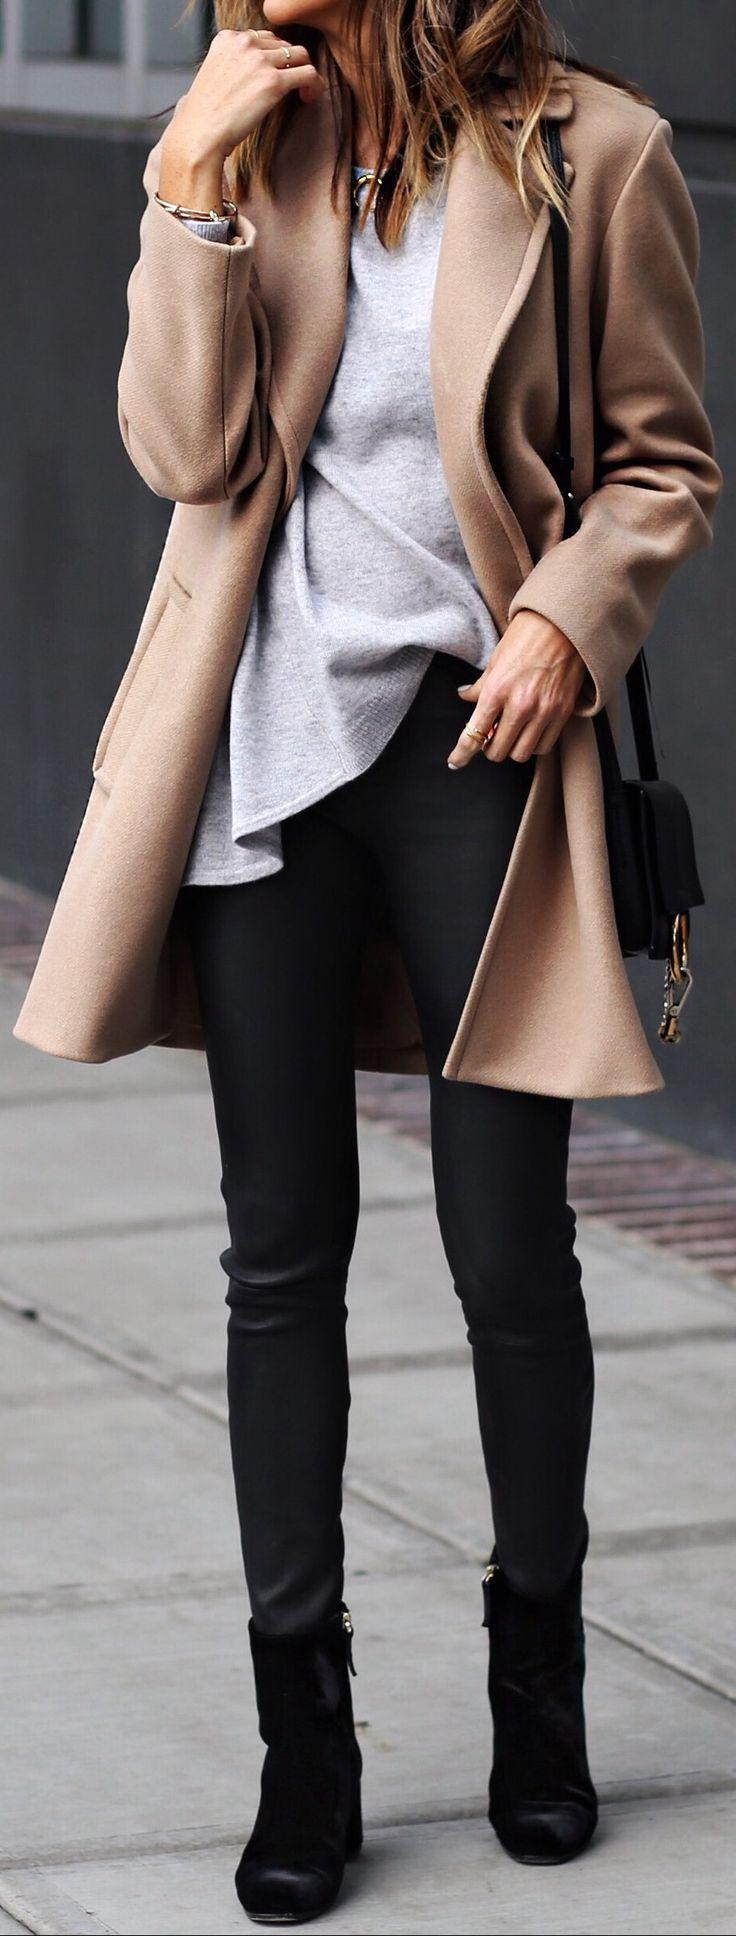 Camel Coat / Grey Knit / Black Skinny Jeans / Black Booties